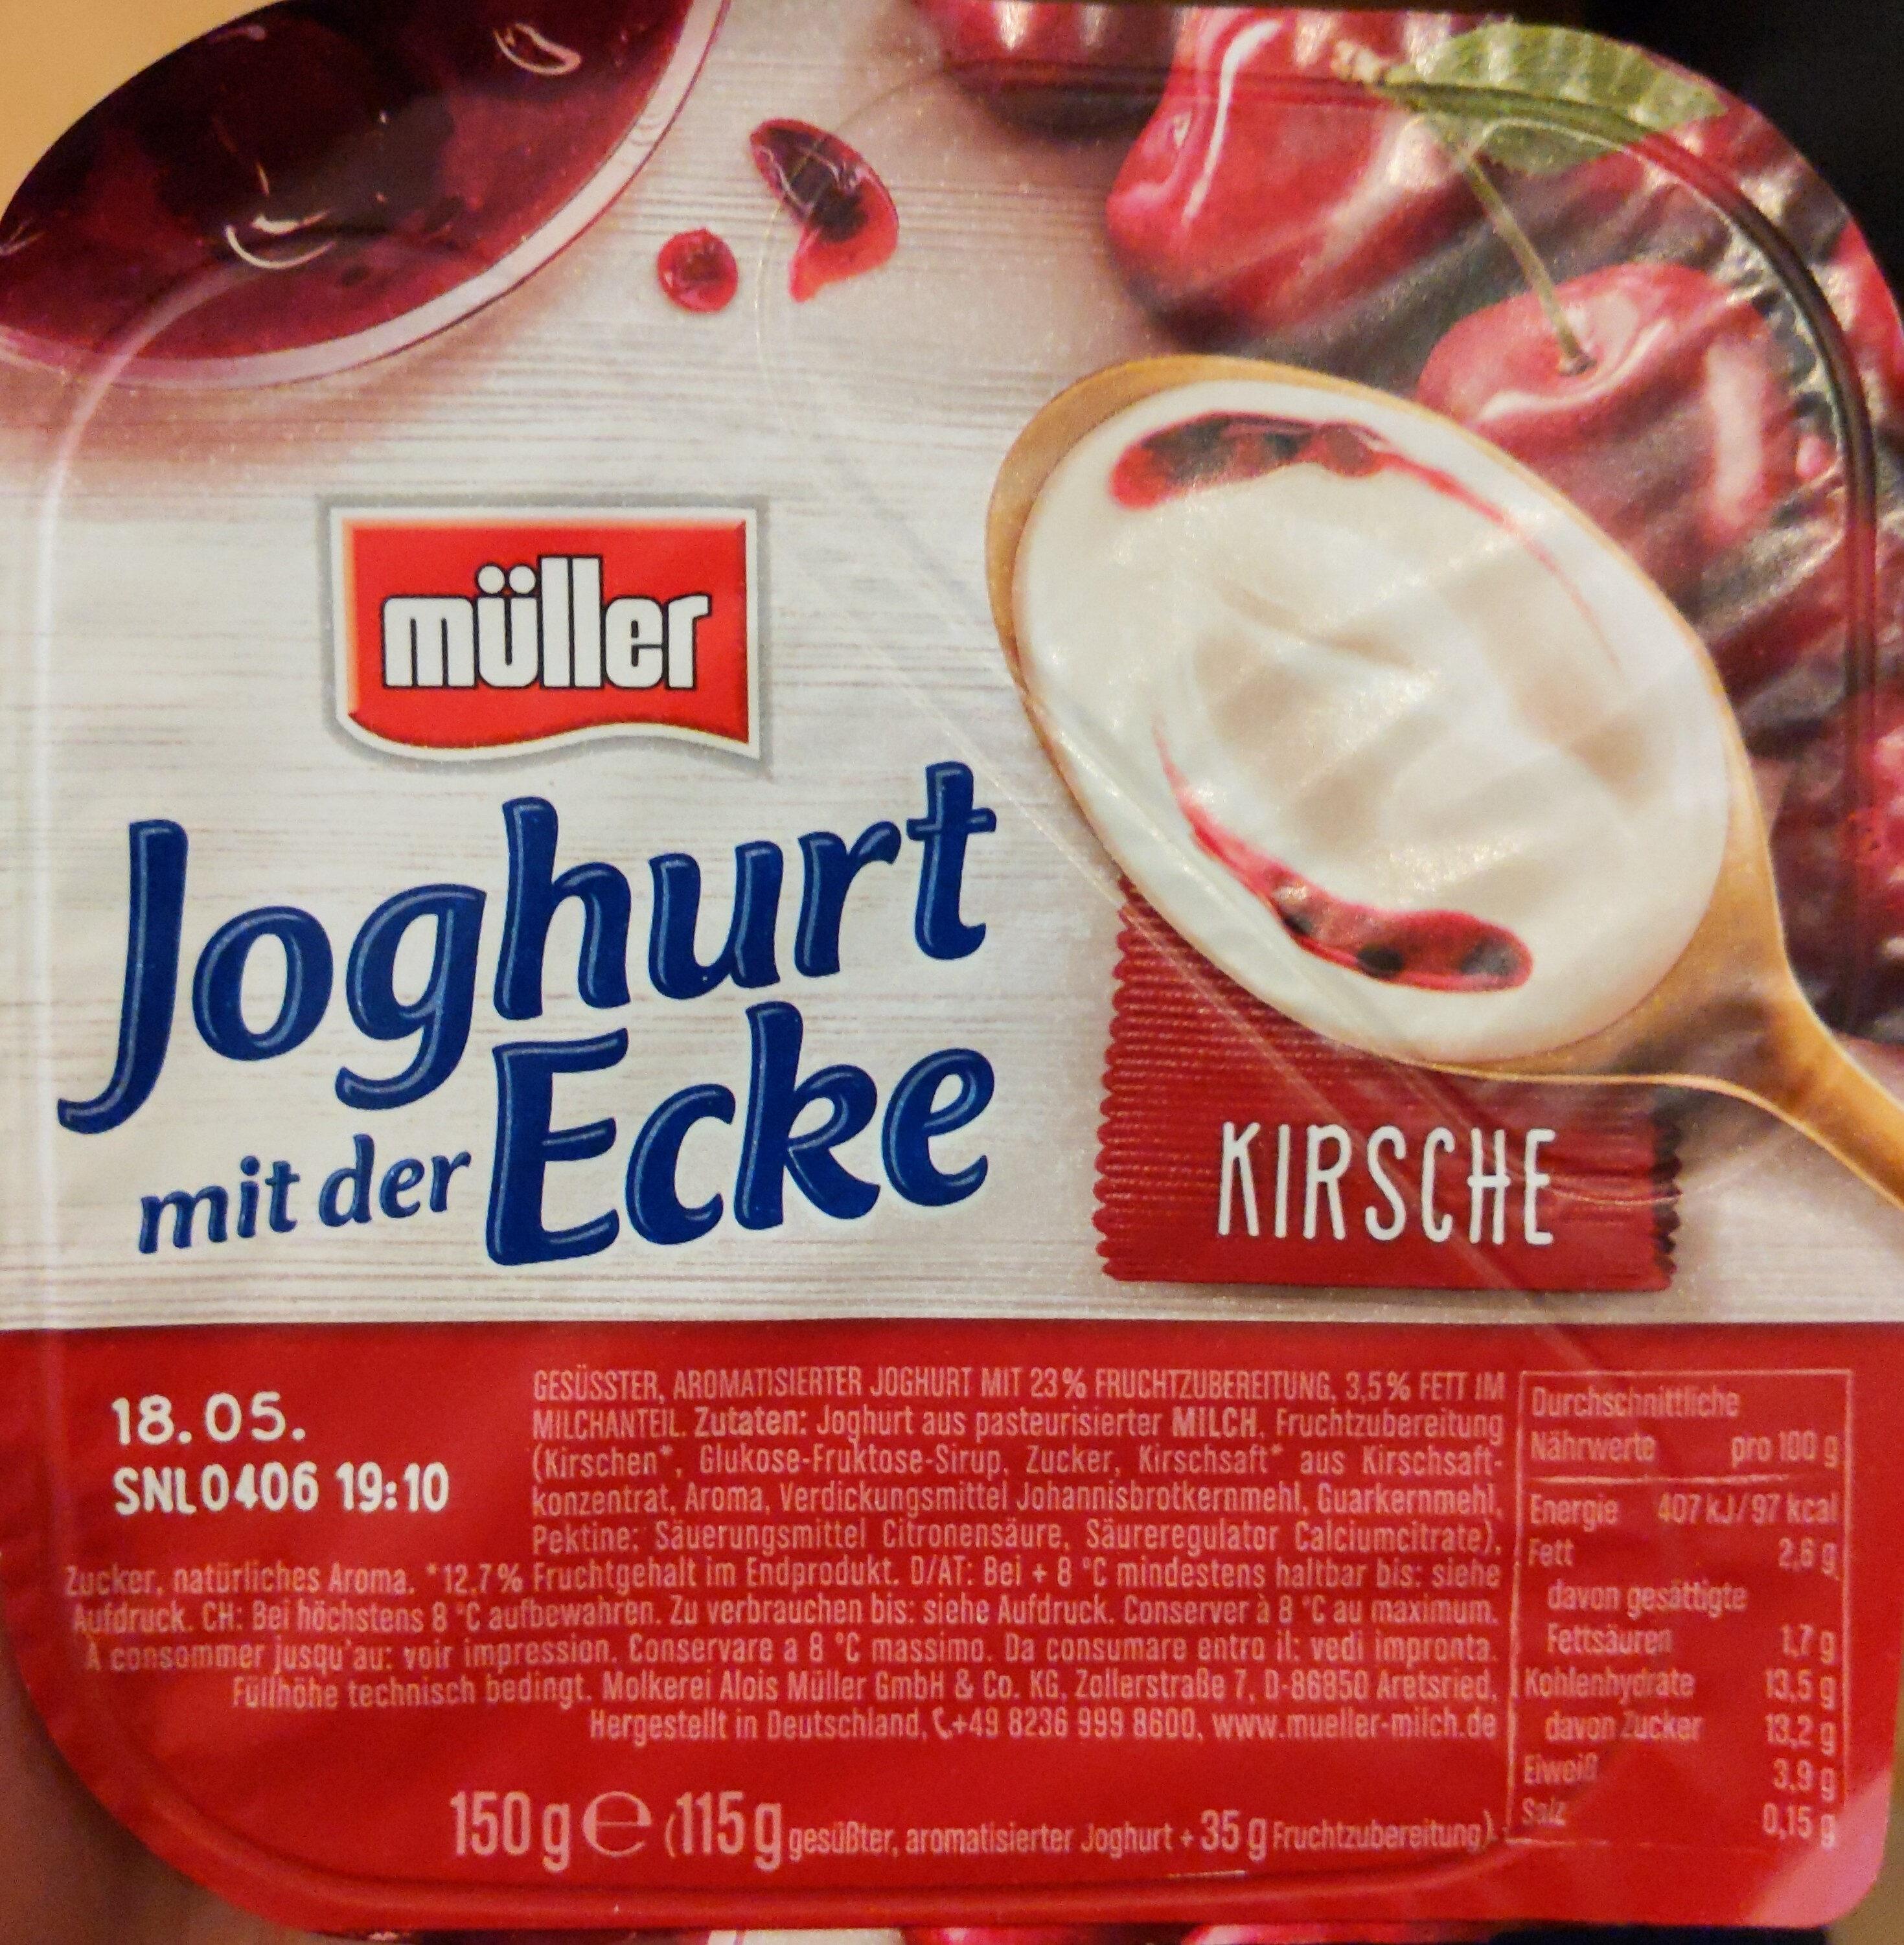 Joghurt mit der Ecke Kirsche - Produkt - de